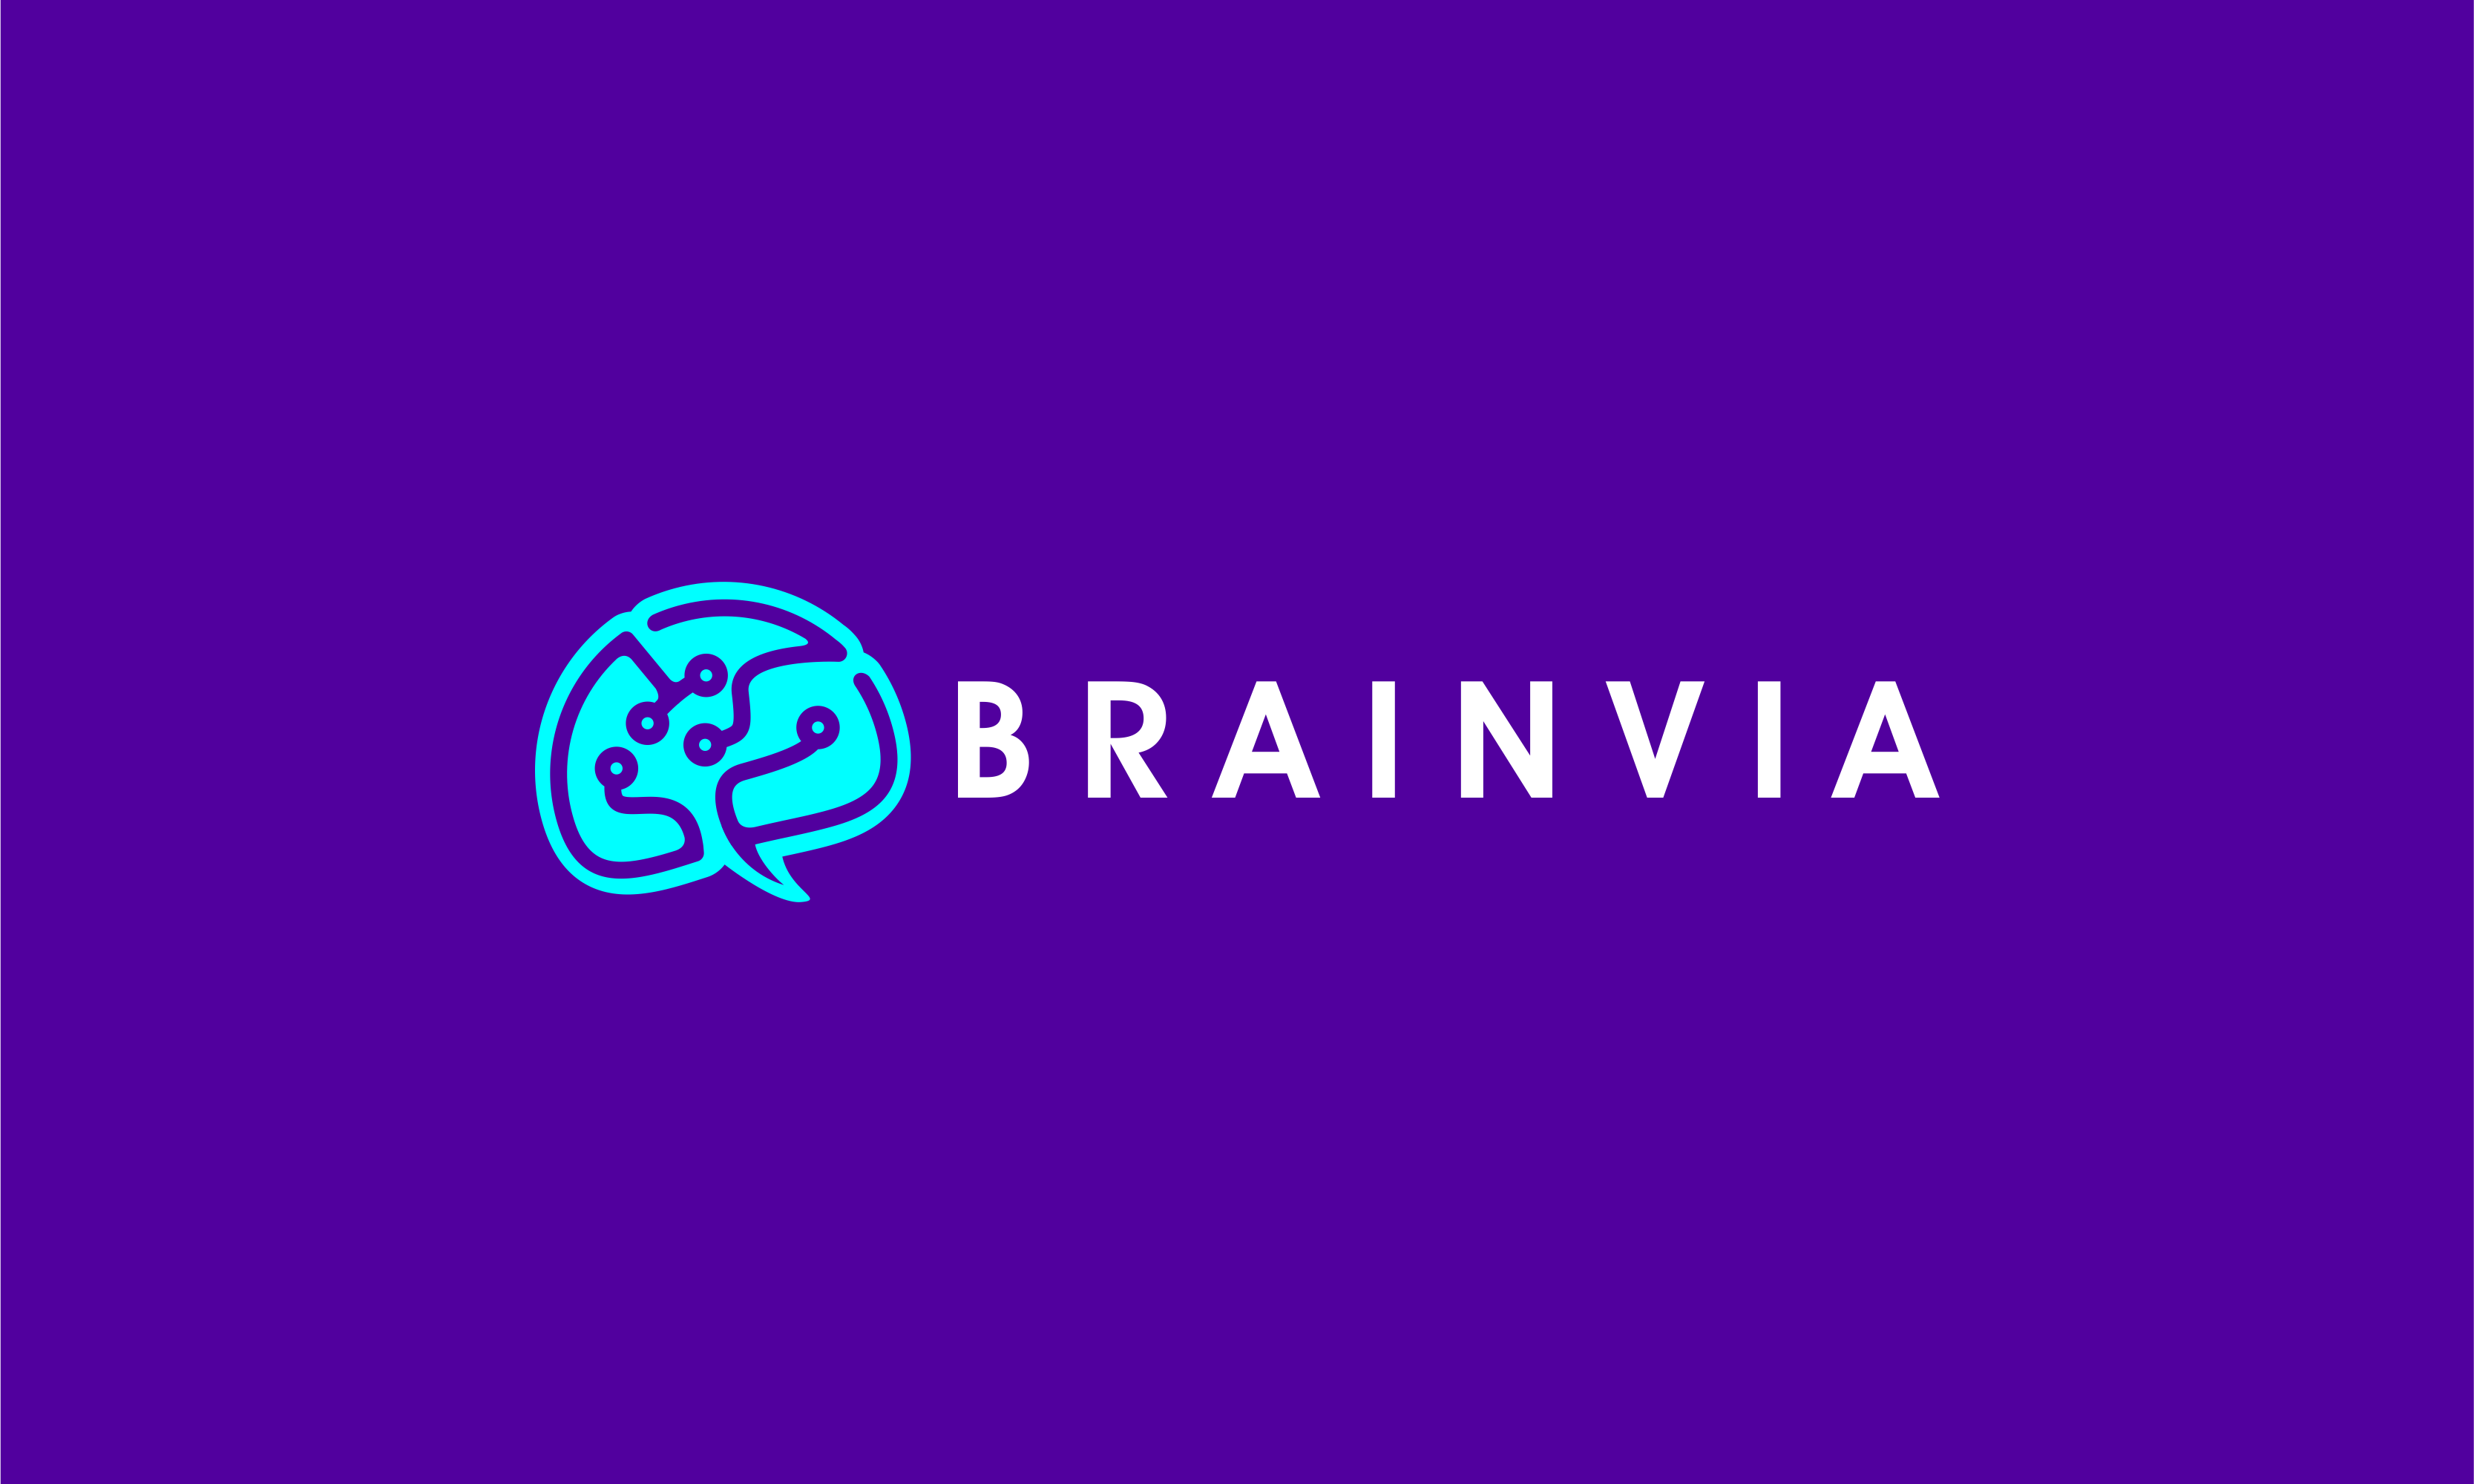 Brainvia